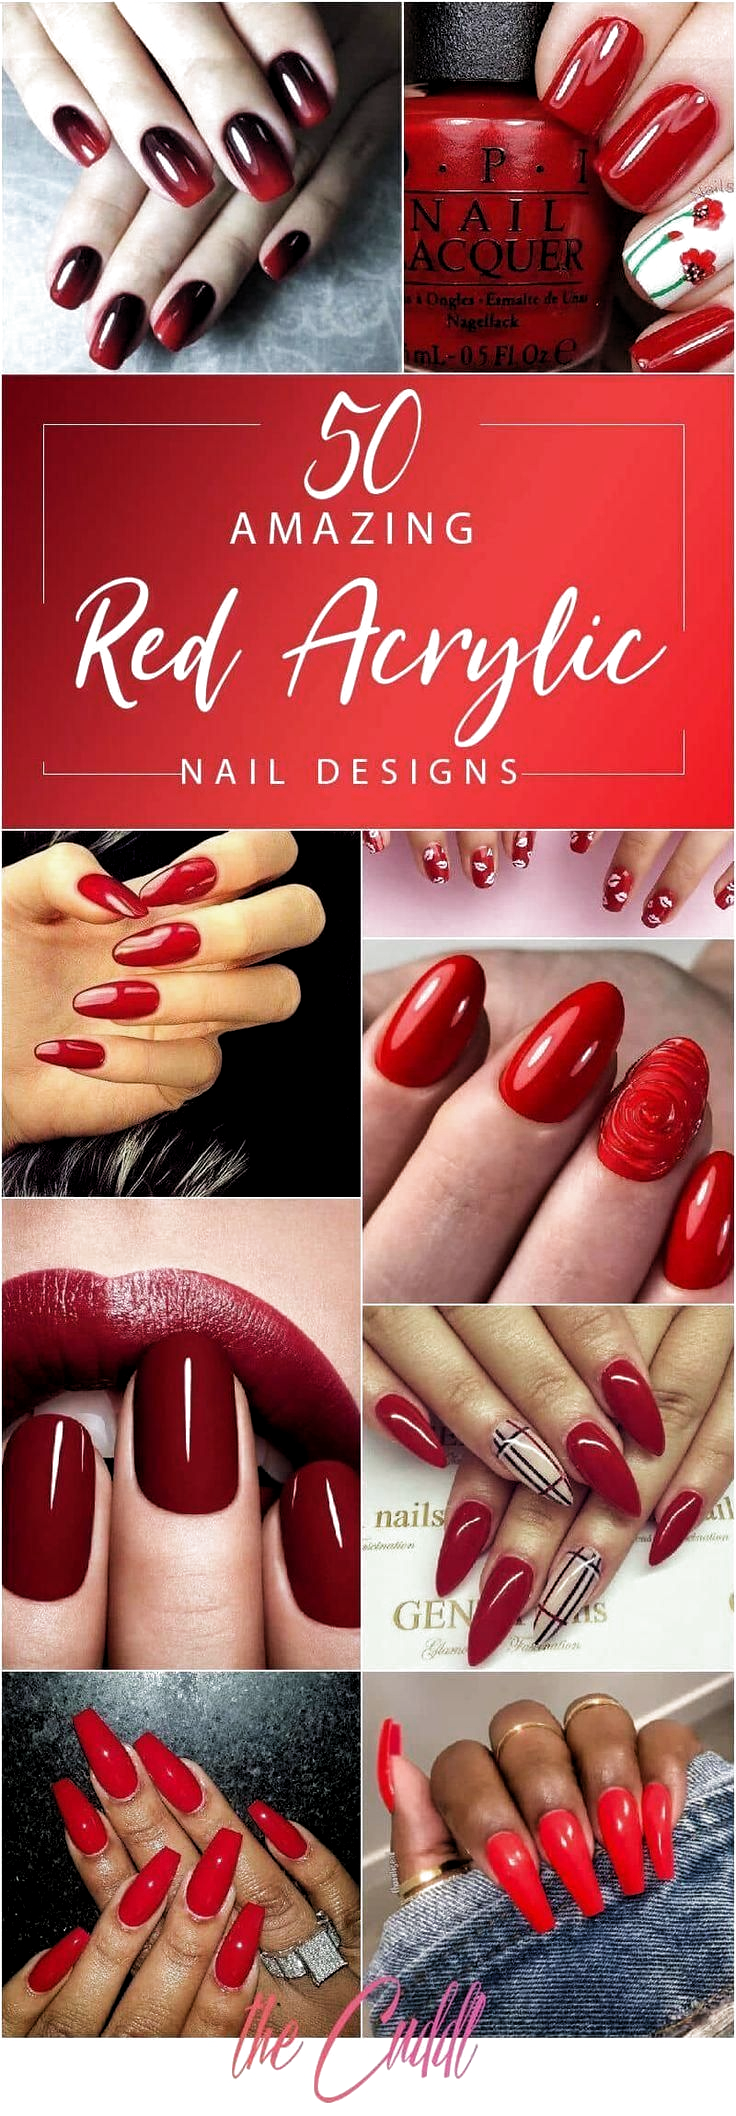 50 kreative rote Acrylnägel Designs, die Sie inspirieren #acrylic #creative #de…